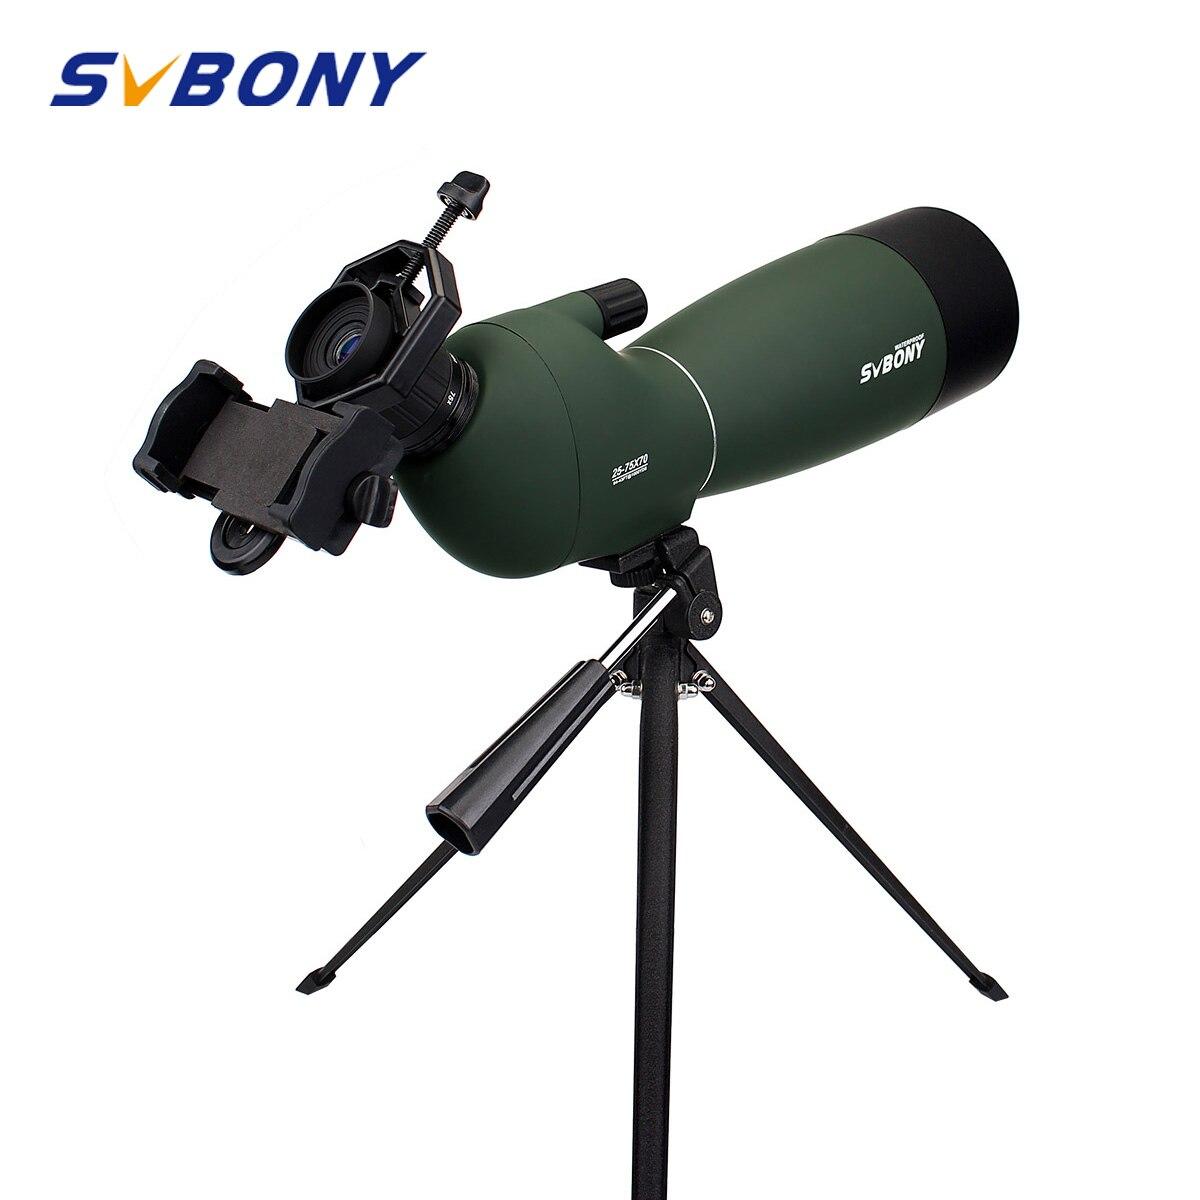 svbony sv28 50 60 70mm visando o escopo zoom telescopio a prova d agua caca monocular